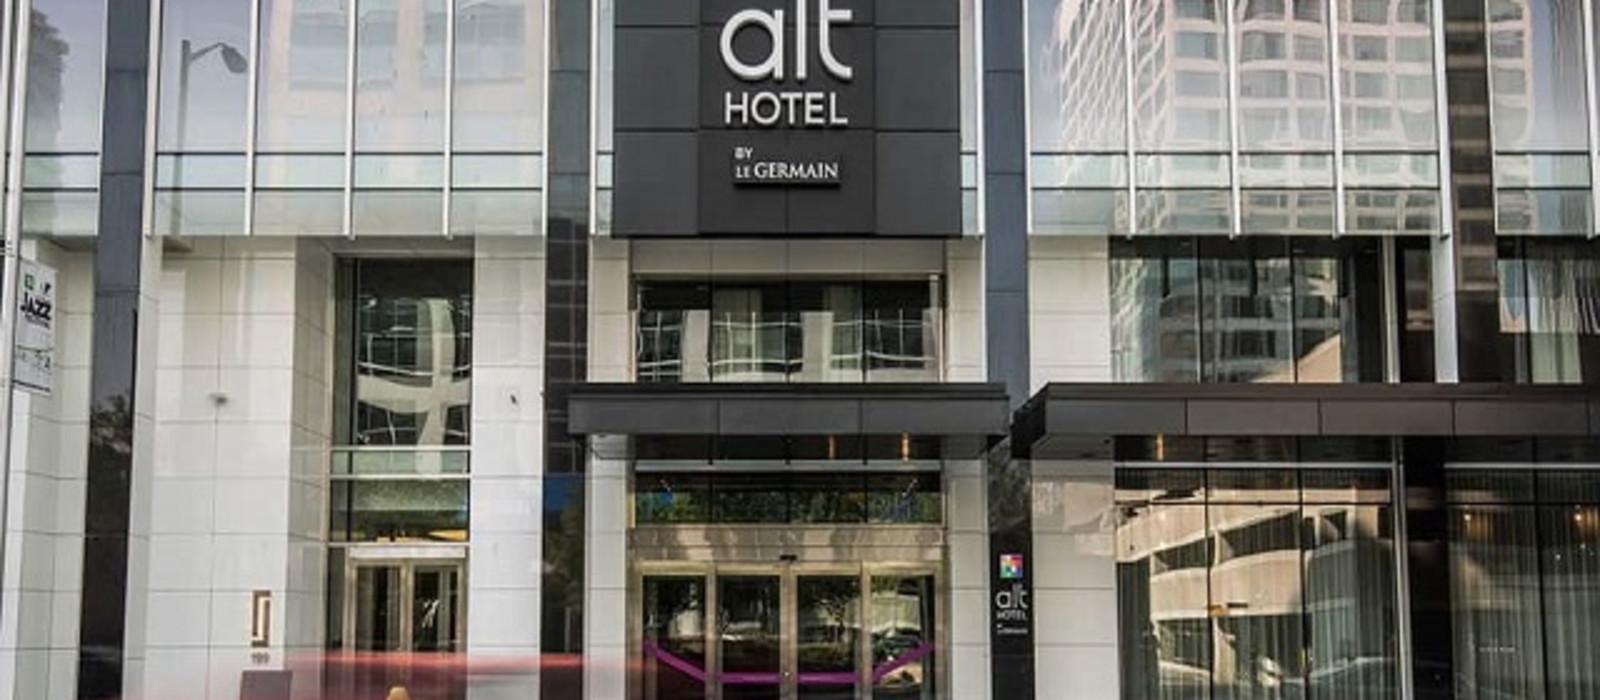 Hotel Alt  Kanada